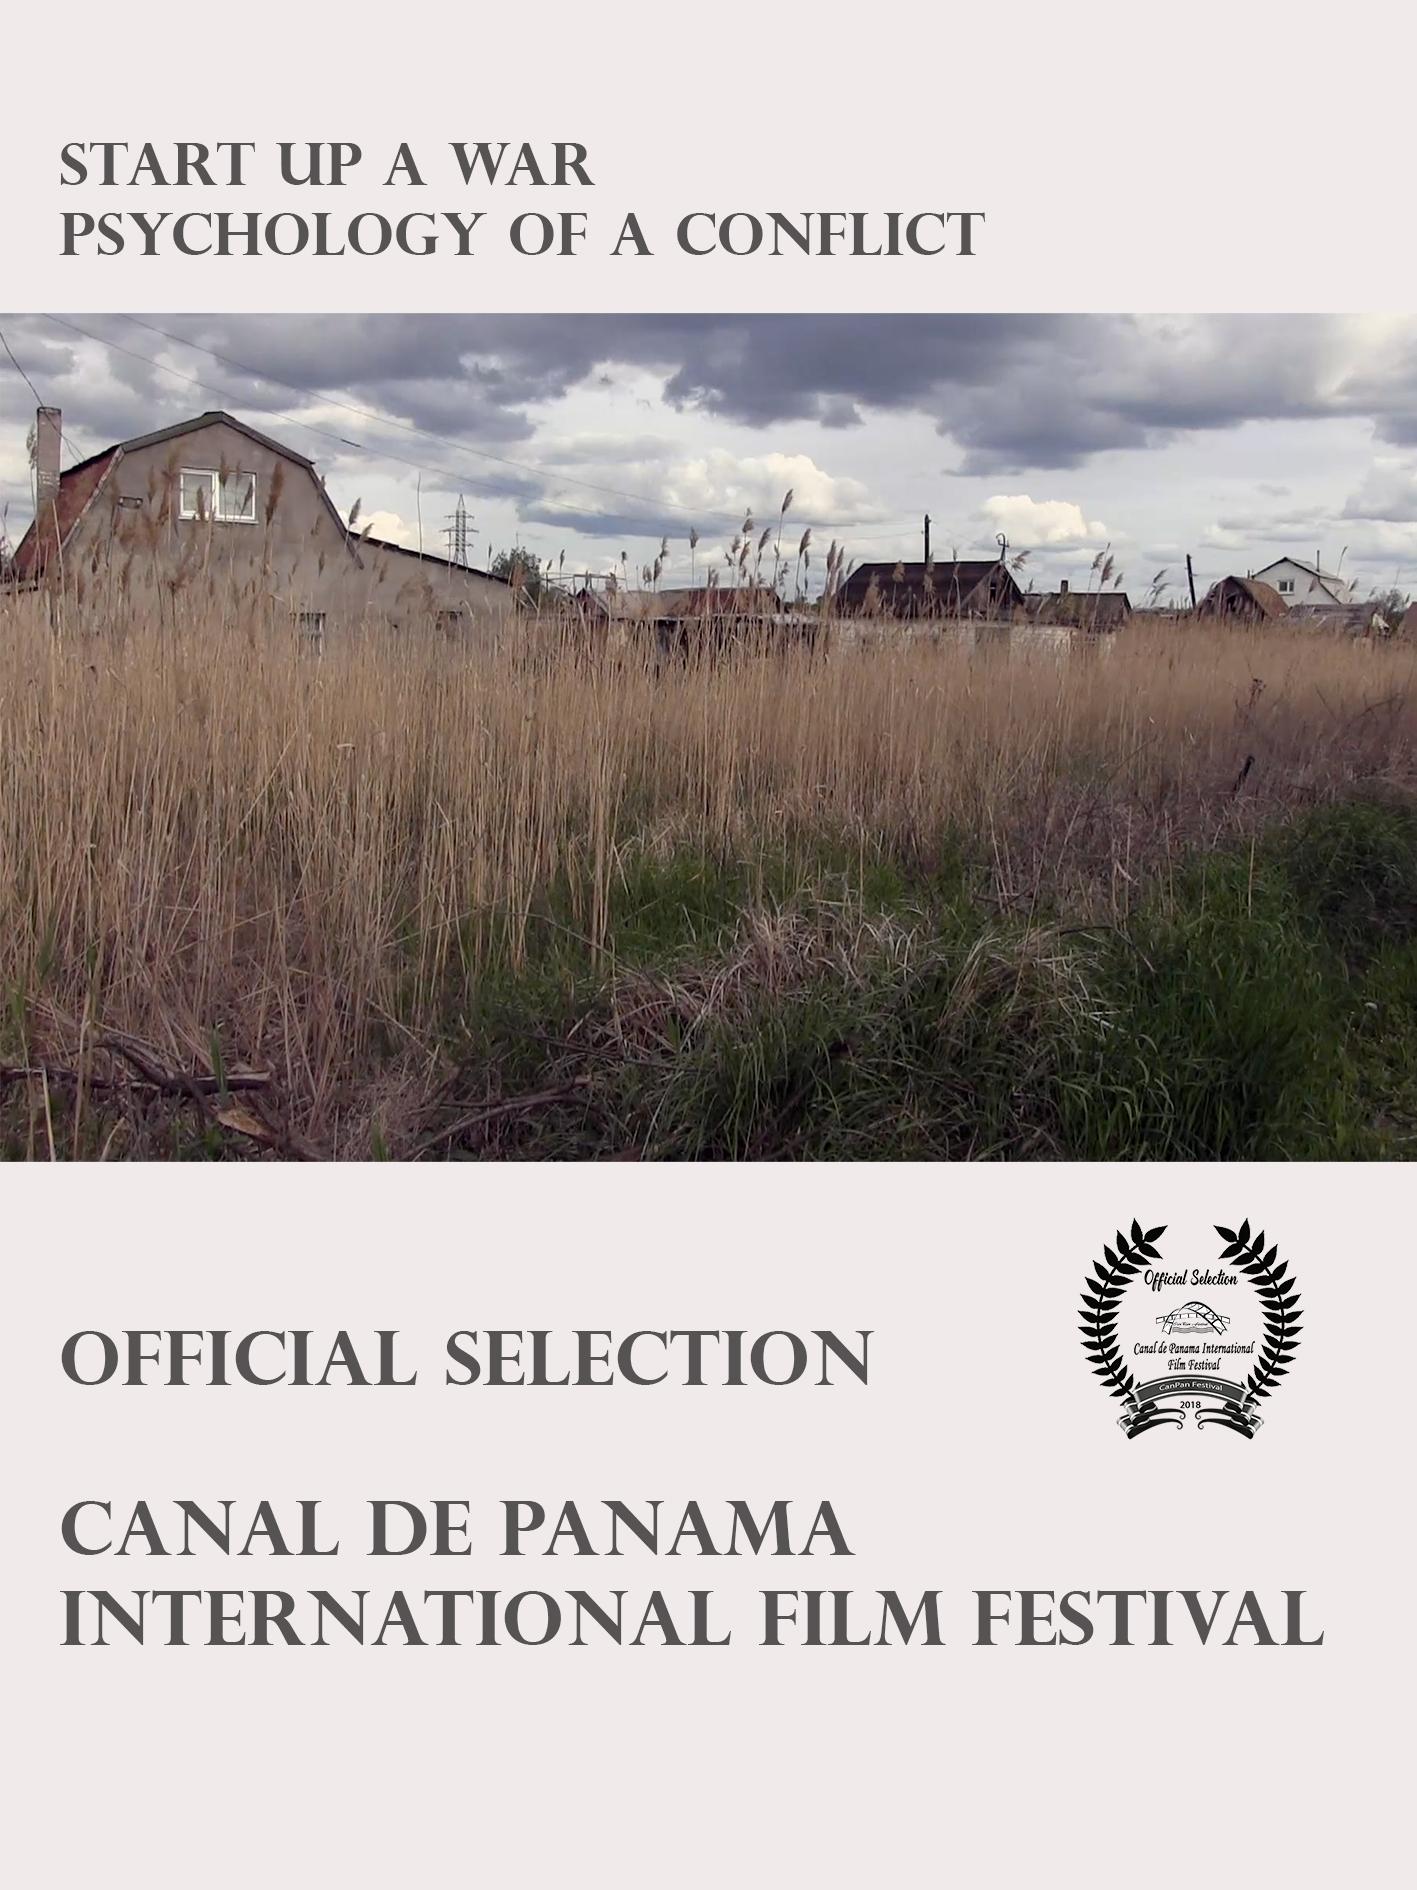 Sara Reginella | Canal de Panama International Film Festival